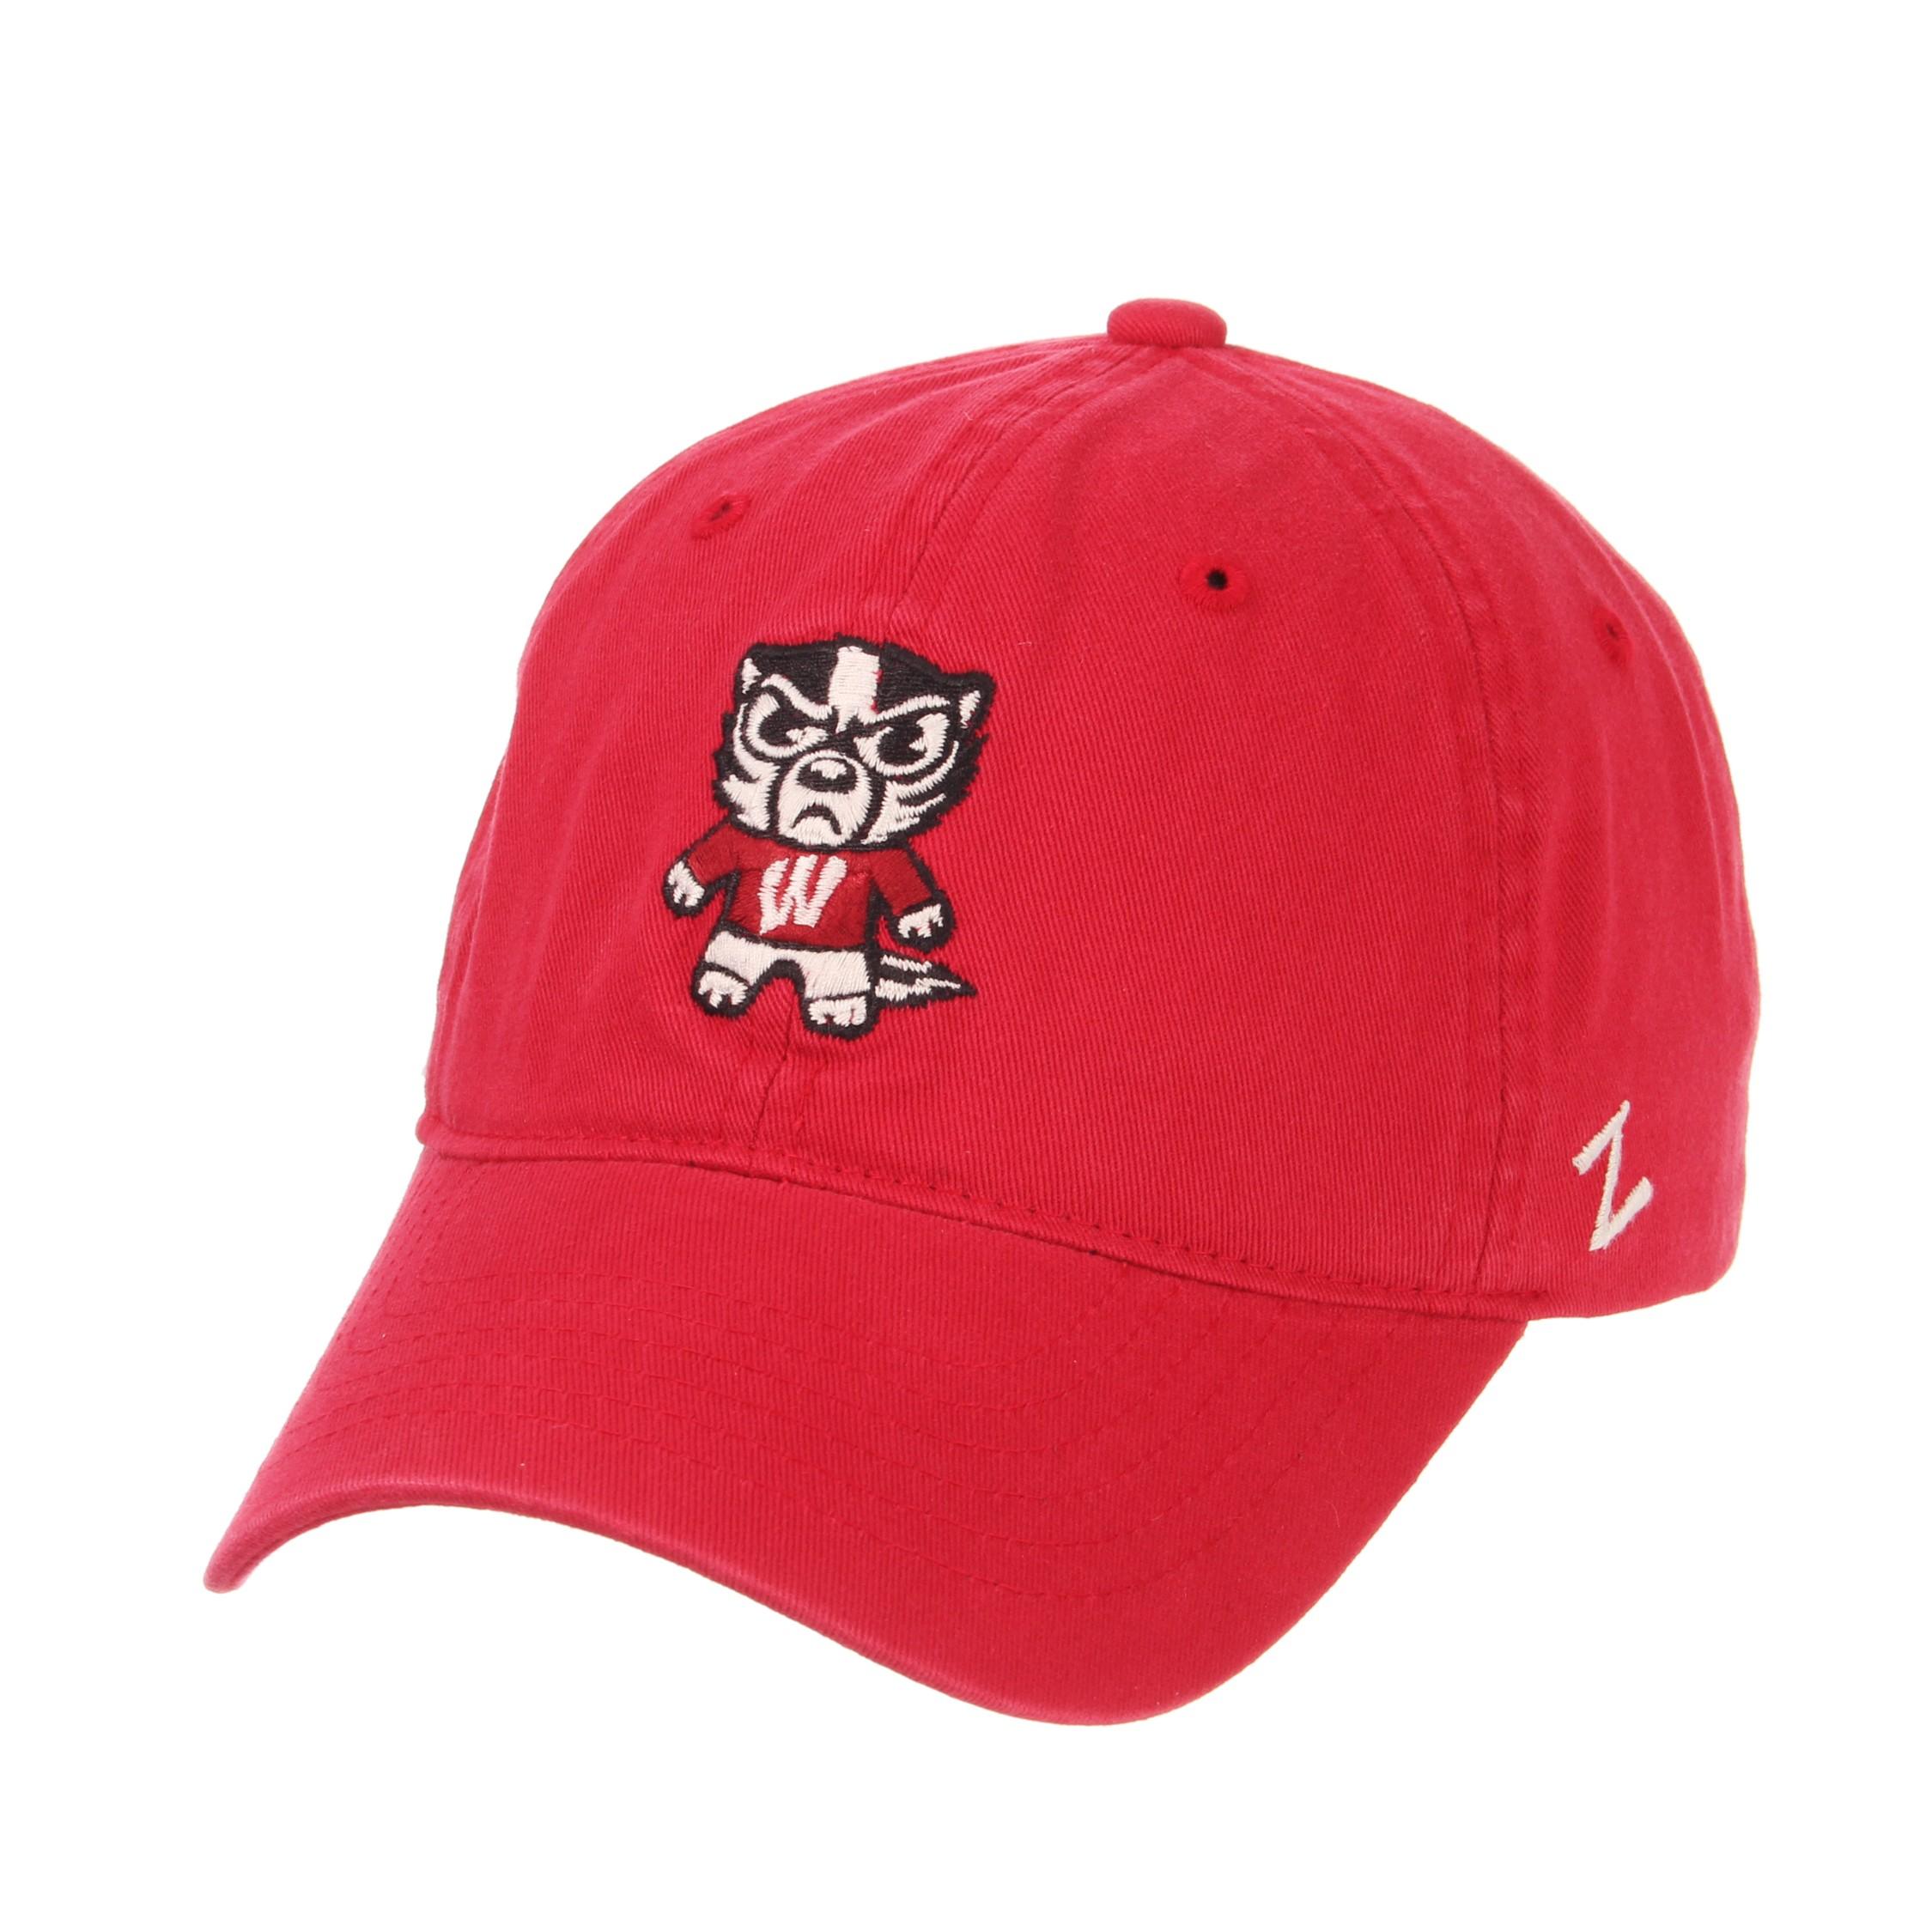 Black Adjustable NCAA Zephyr Wisconsin Badgers Mens Harajuku Snapback Hat